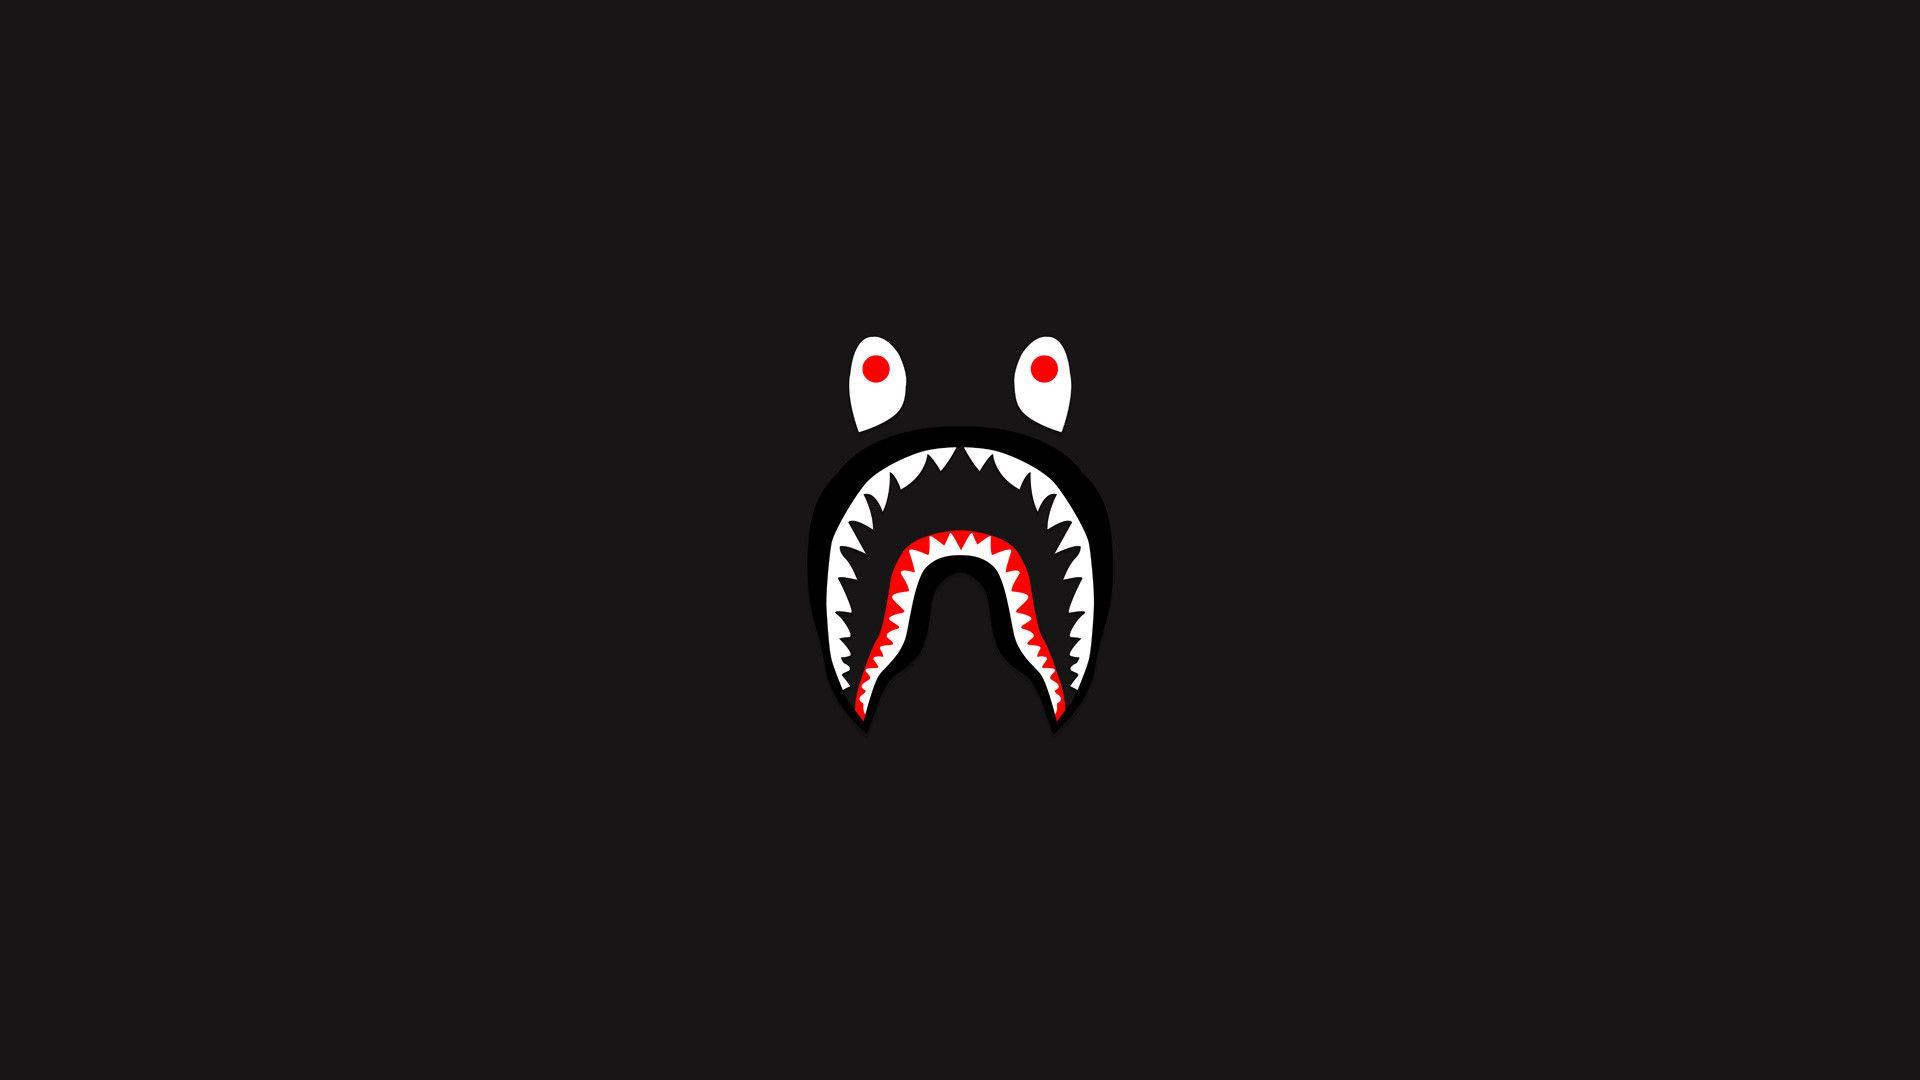 1920x1080 bape shark